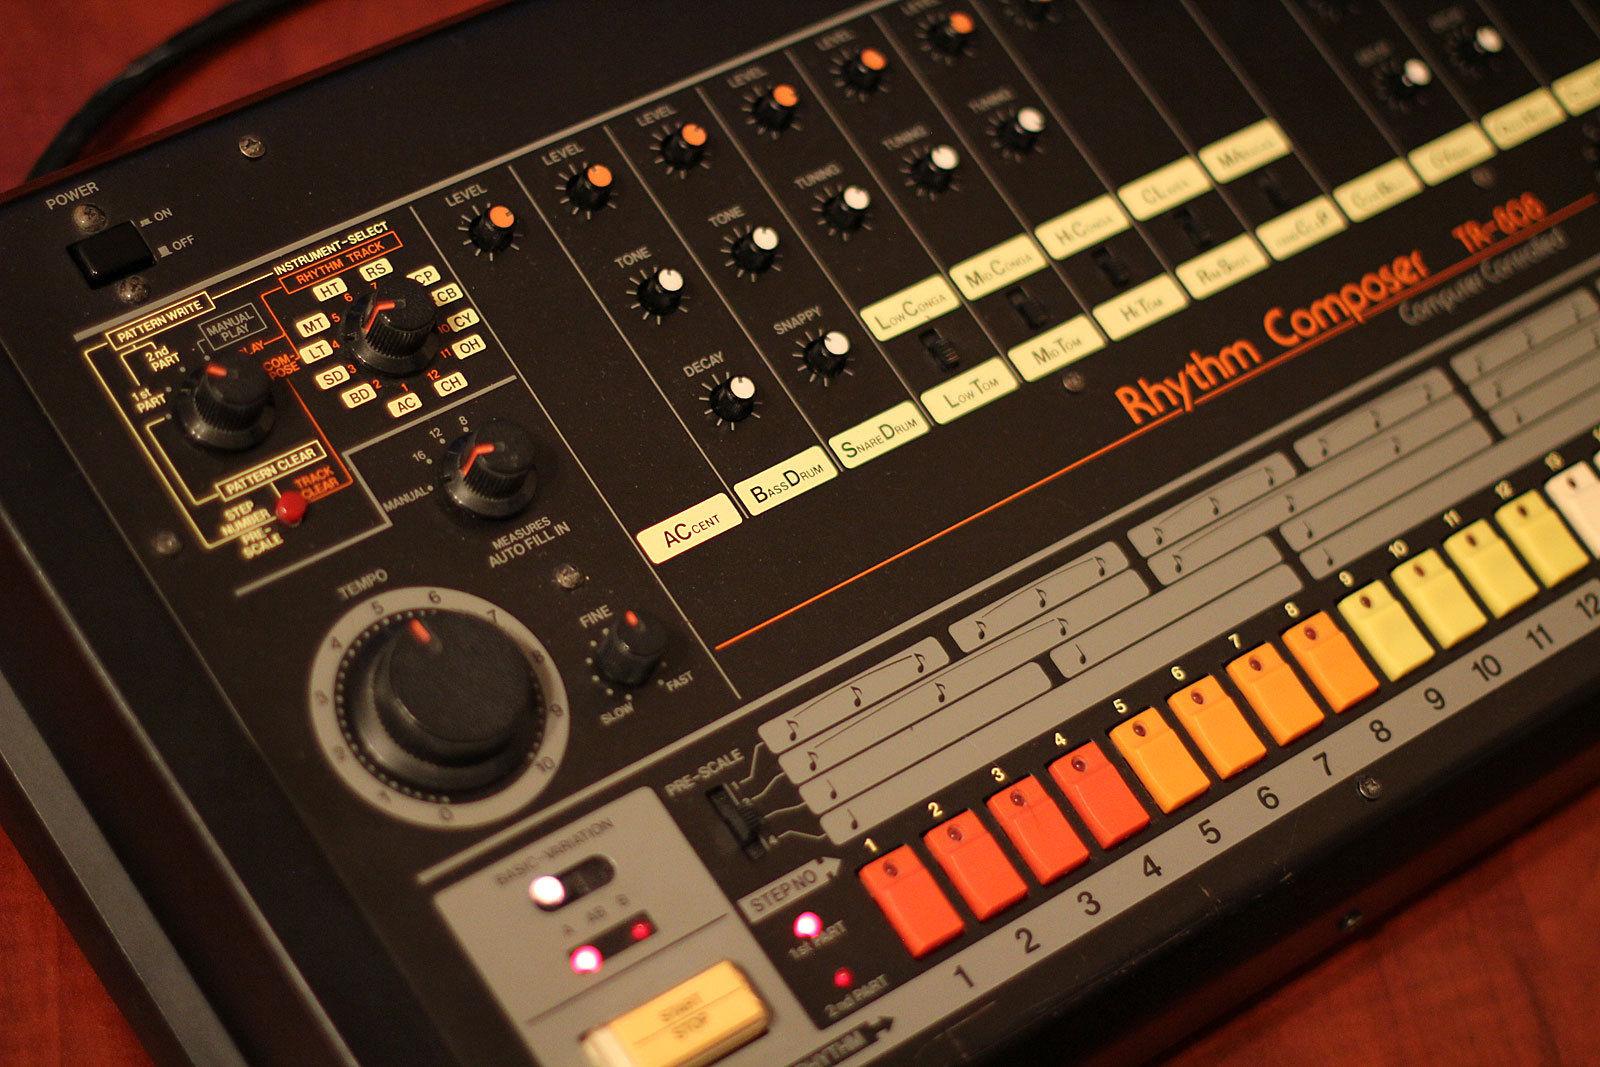 matrixsynth roland tr 808 vintage analog drum machine with midi. Black Bedroom Furniture Sets. Home Design Ideas